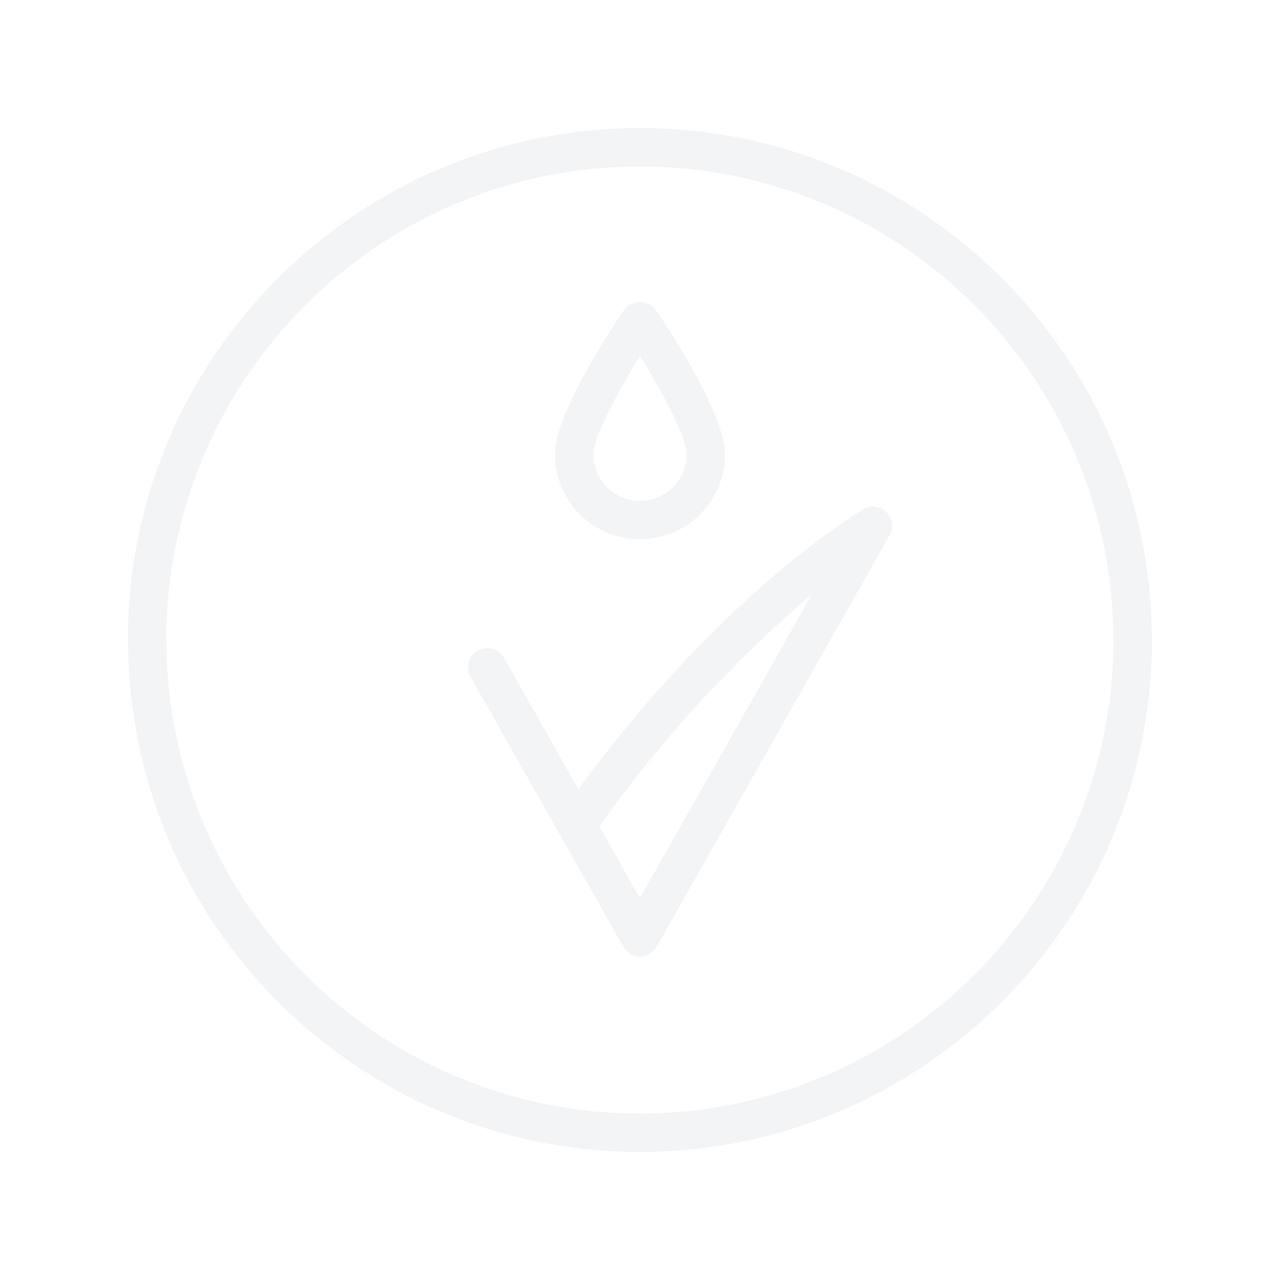 HOLIKA HOLIKA Aloe Soothing Essence Water Drop Sun Stick SPF50 17g солнцезащитный стик